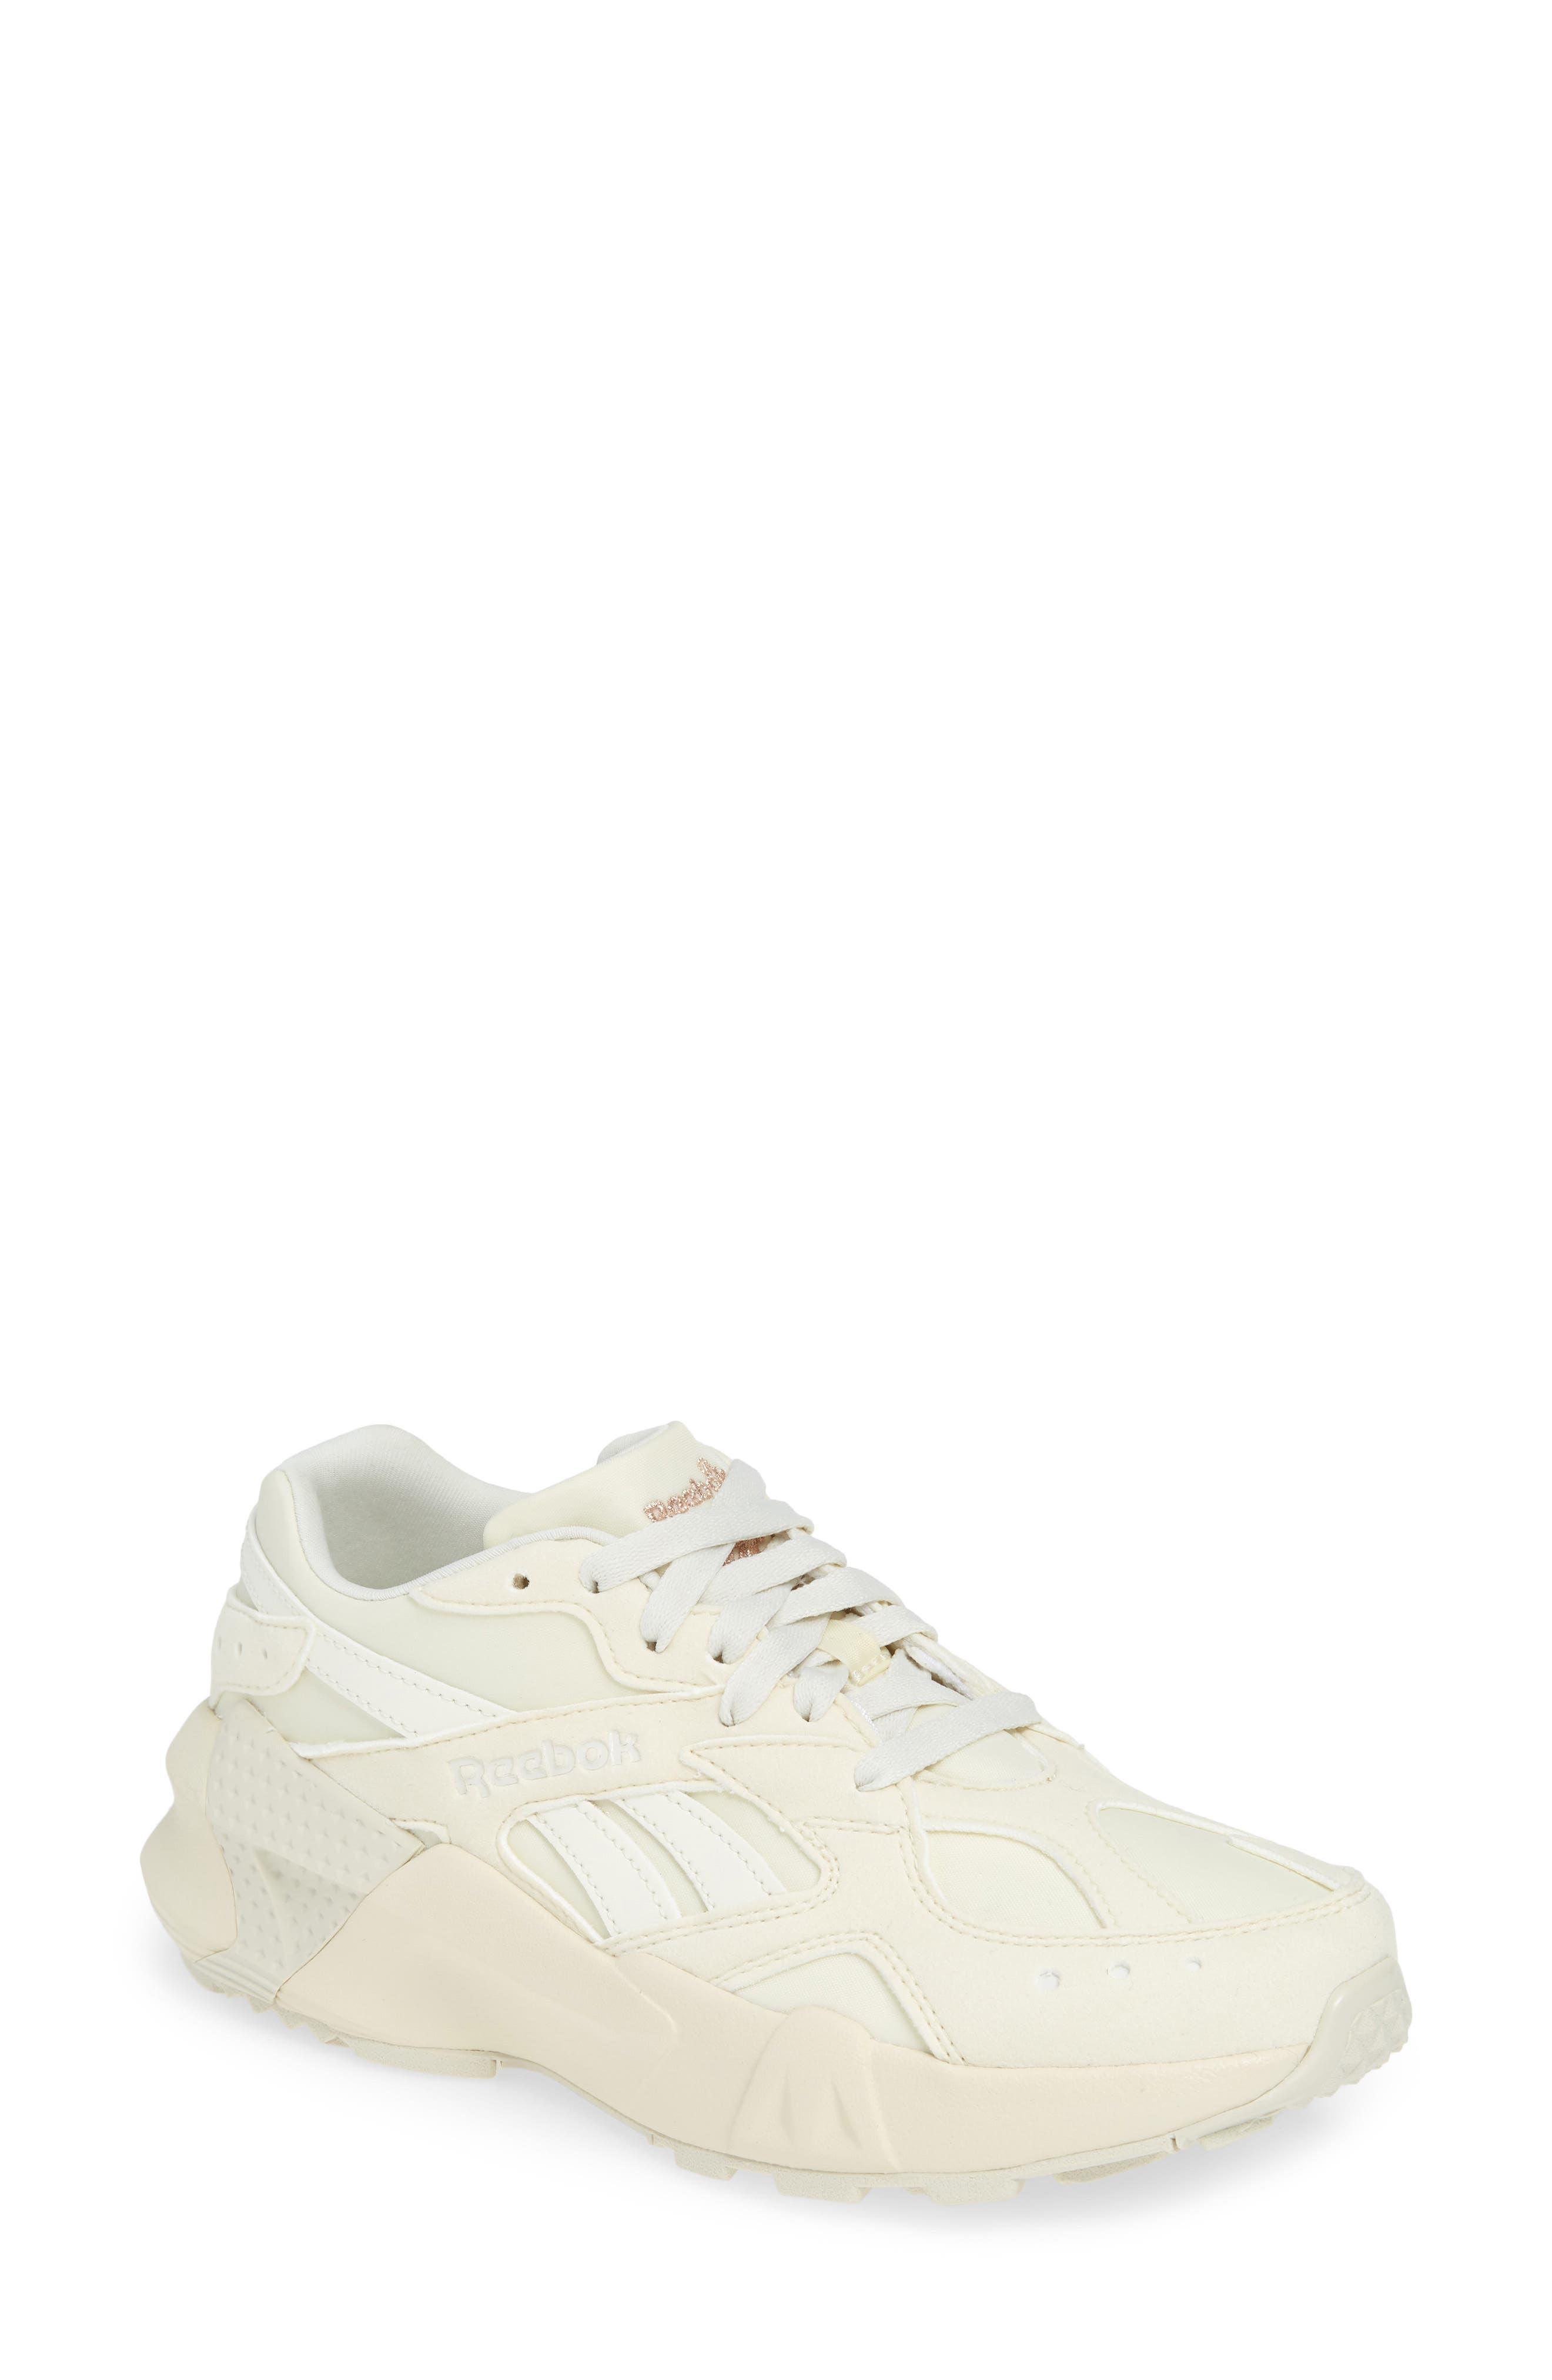 Reebok Aztrek Sneaker / 5 Men